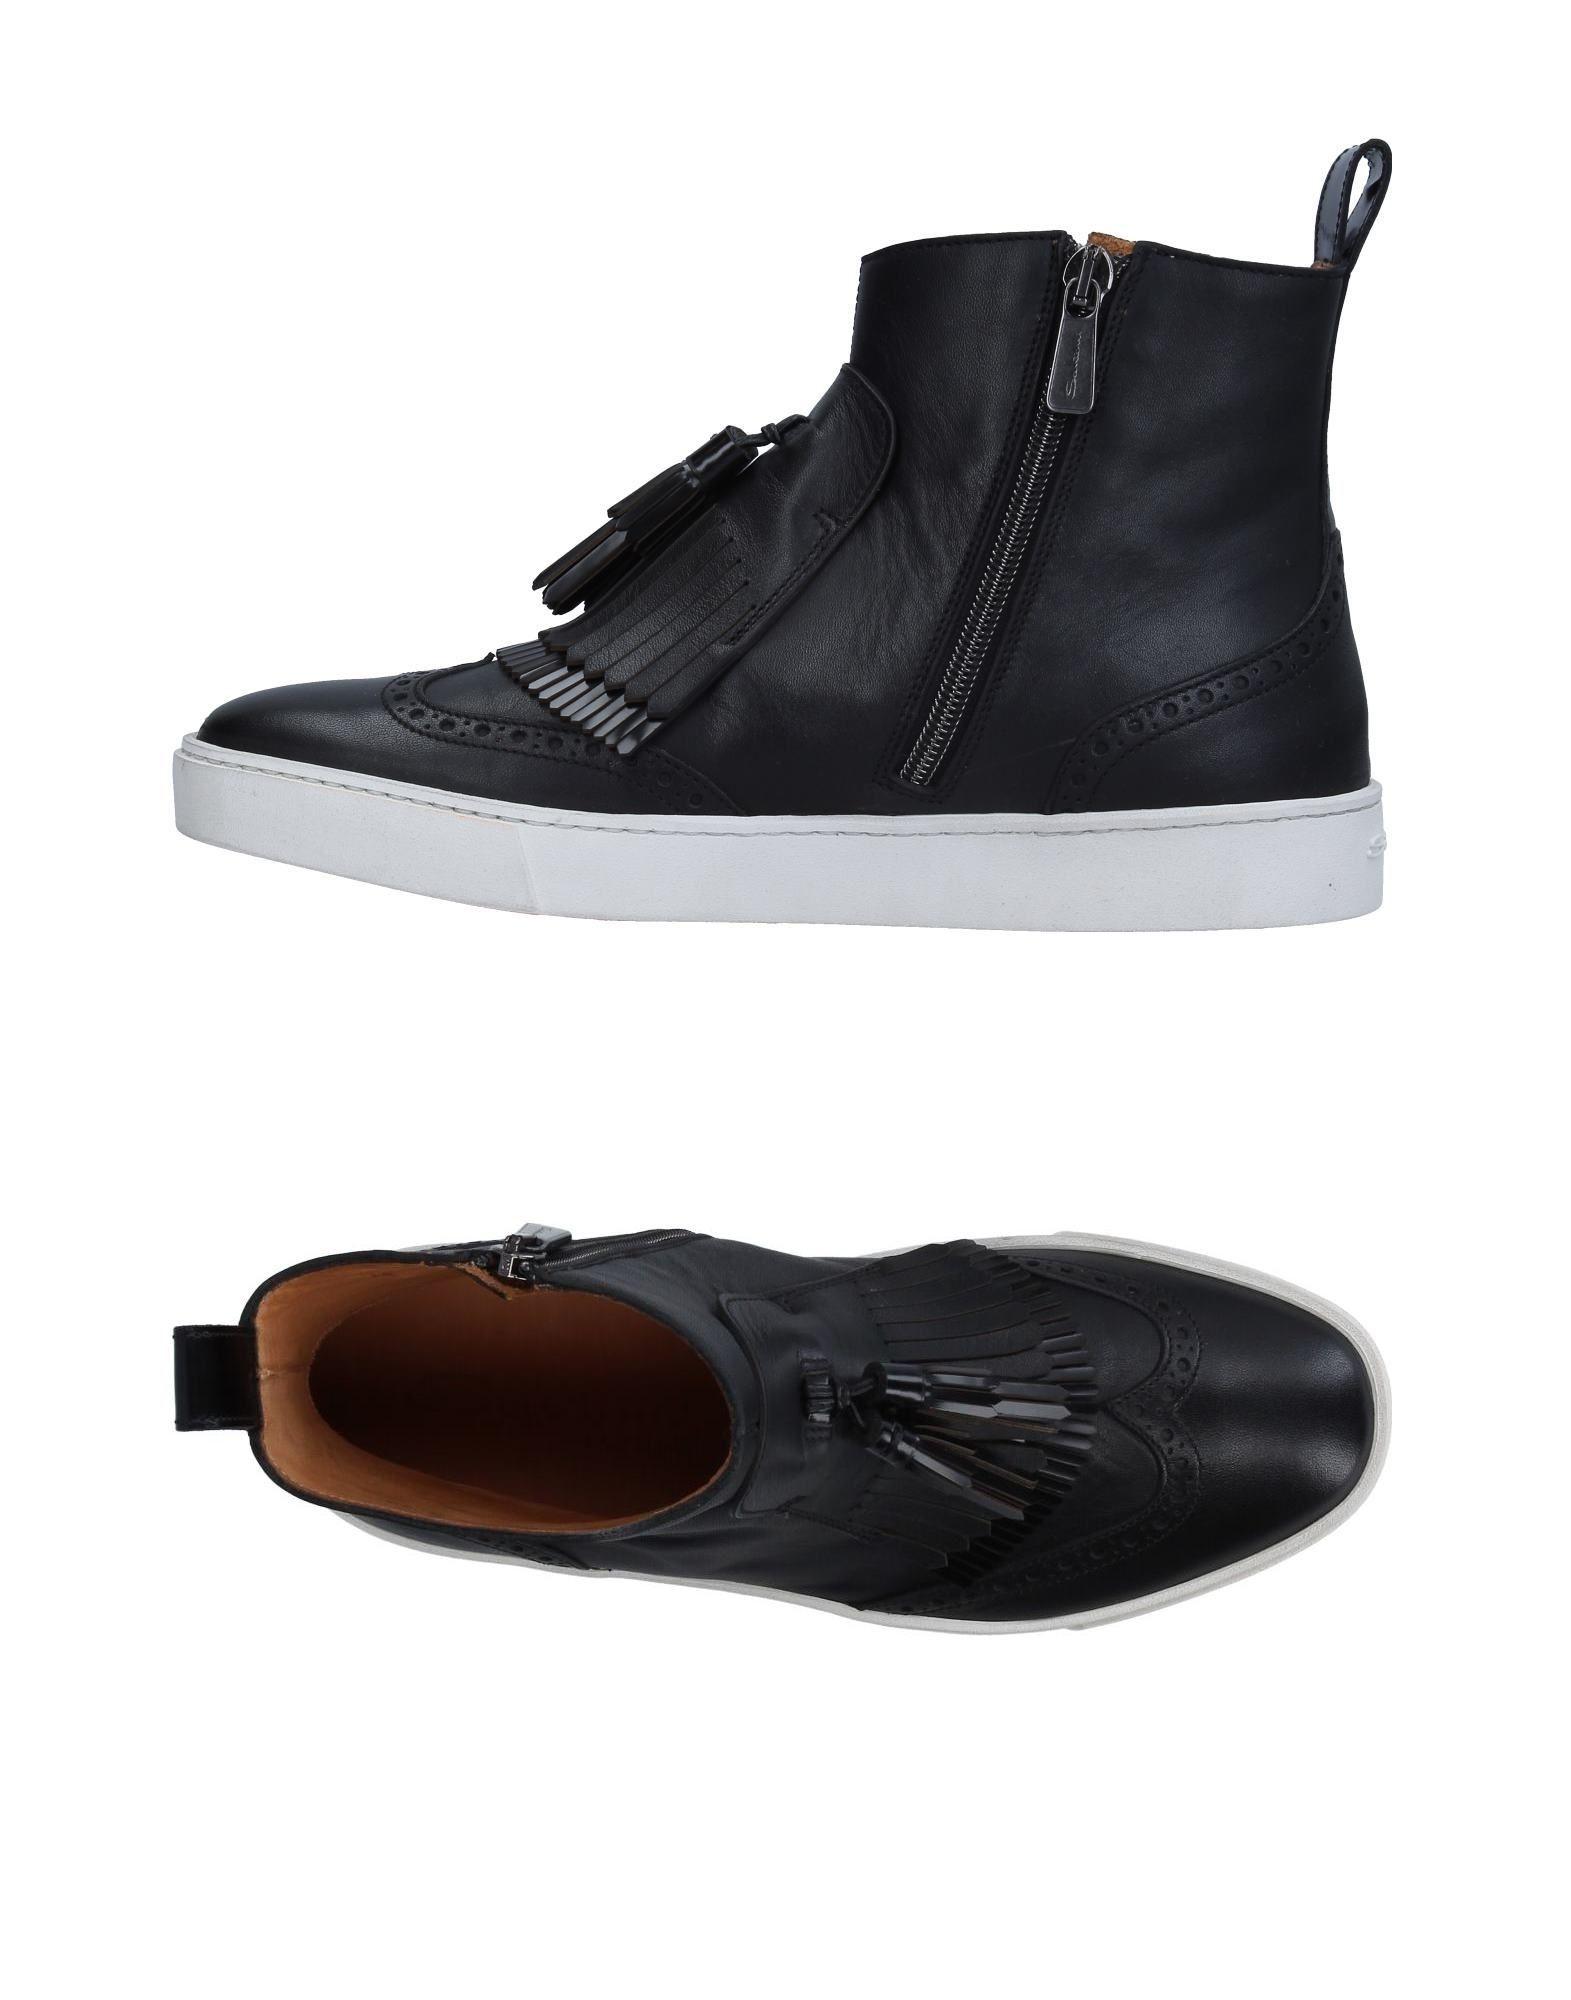 Santoni Sneakers - Women Women Women Santoni Sneakers online on  United Kingdom - 11320318MB efb15e